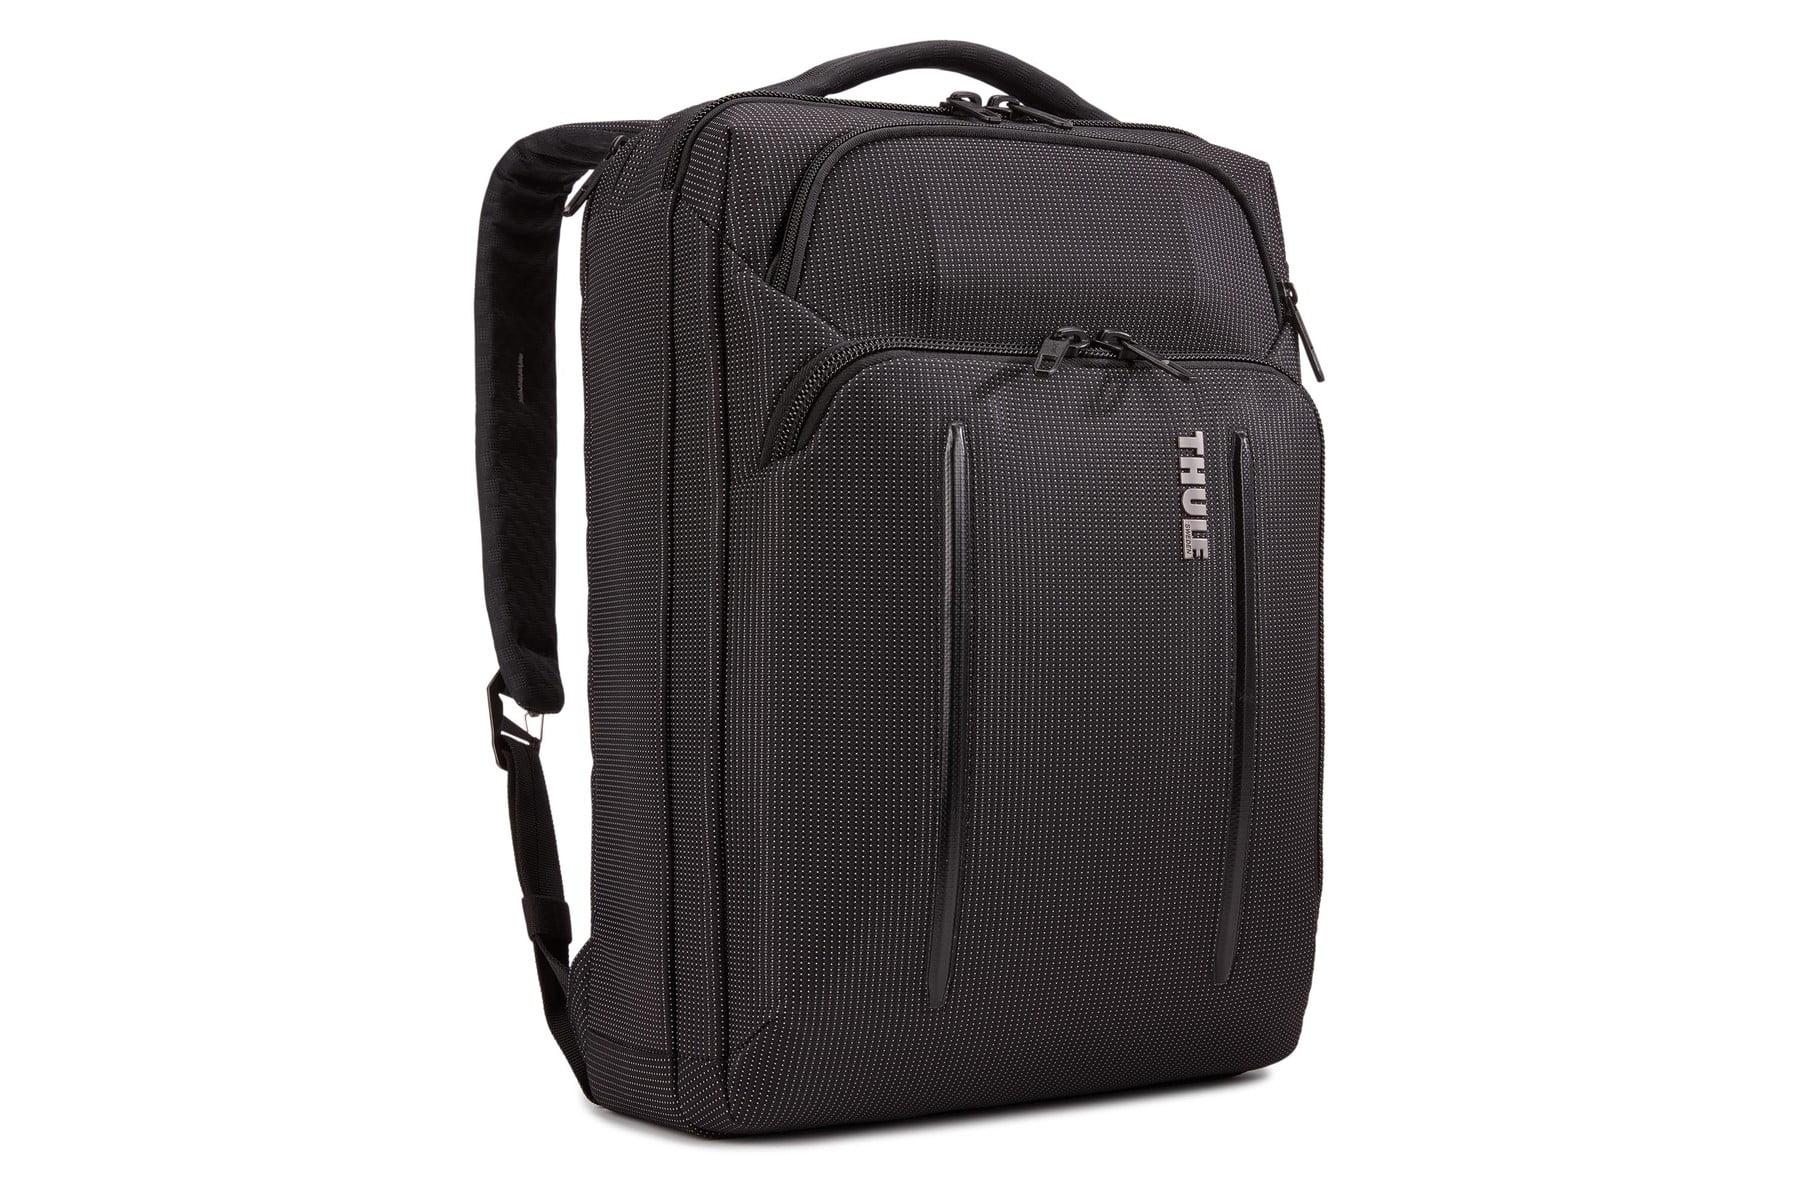 Geanta laptop Thule Crossover 2 Convertible Laptop Bag 15.6 inchi Black 4